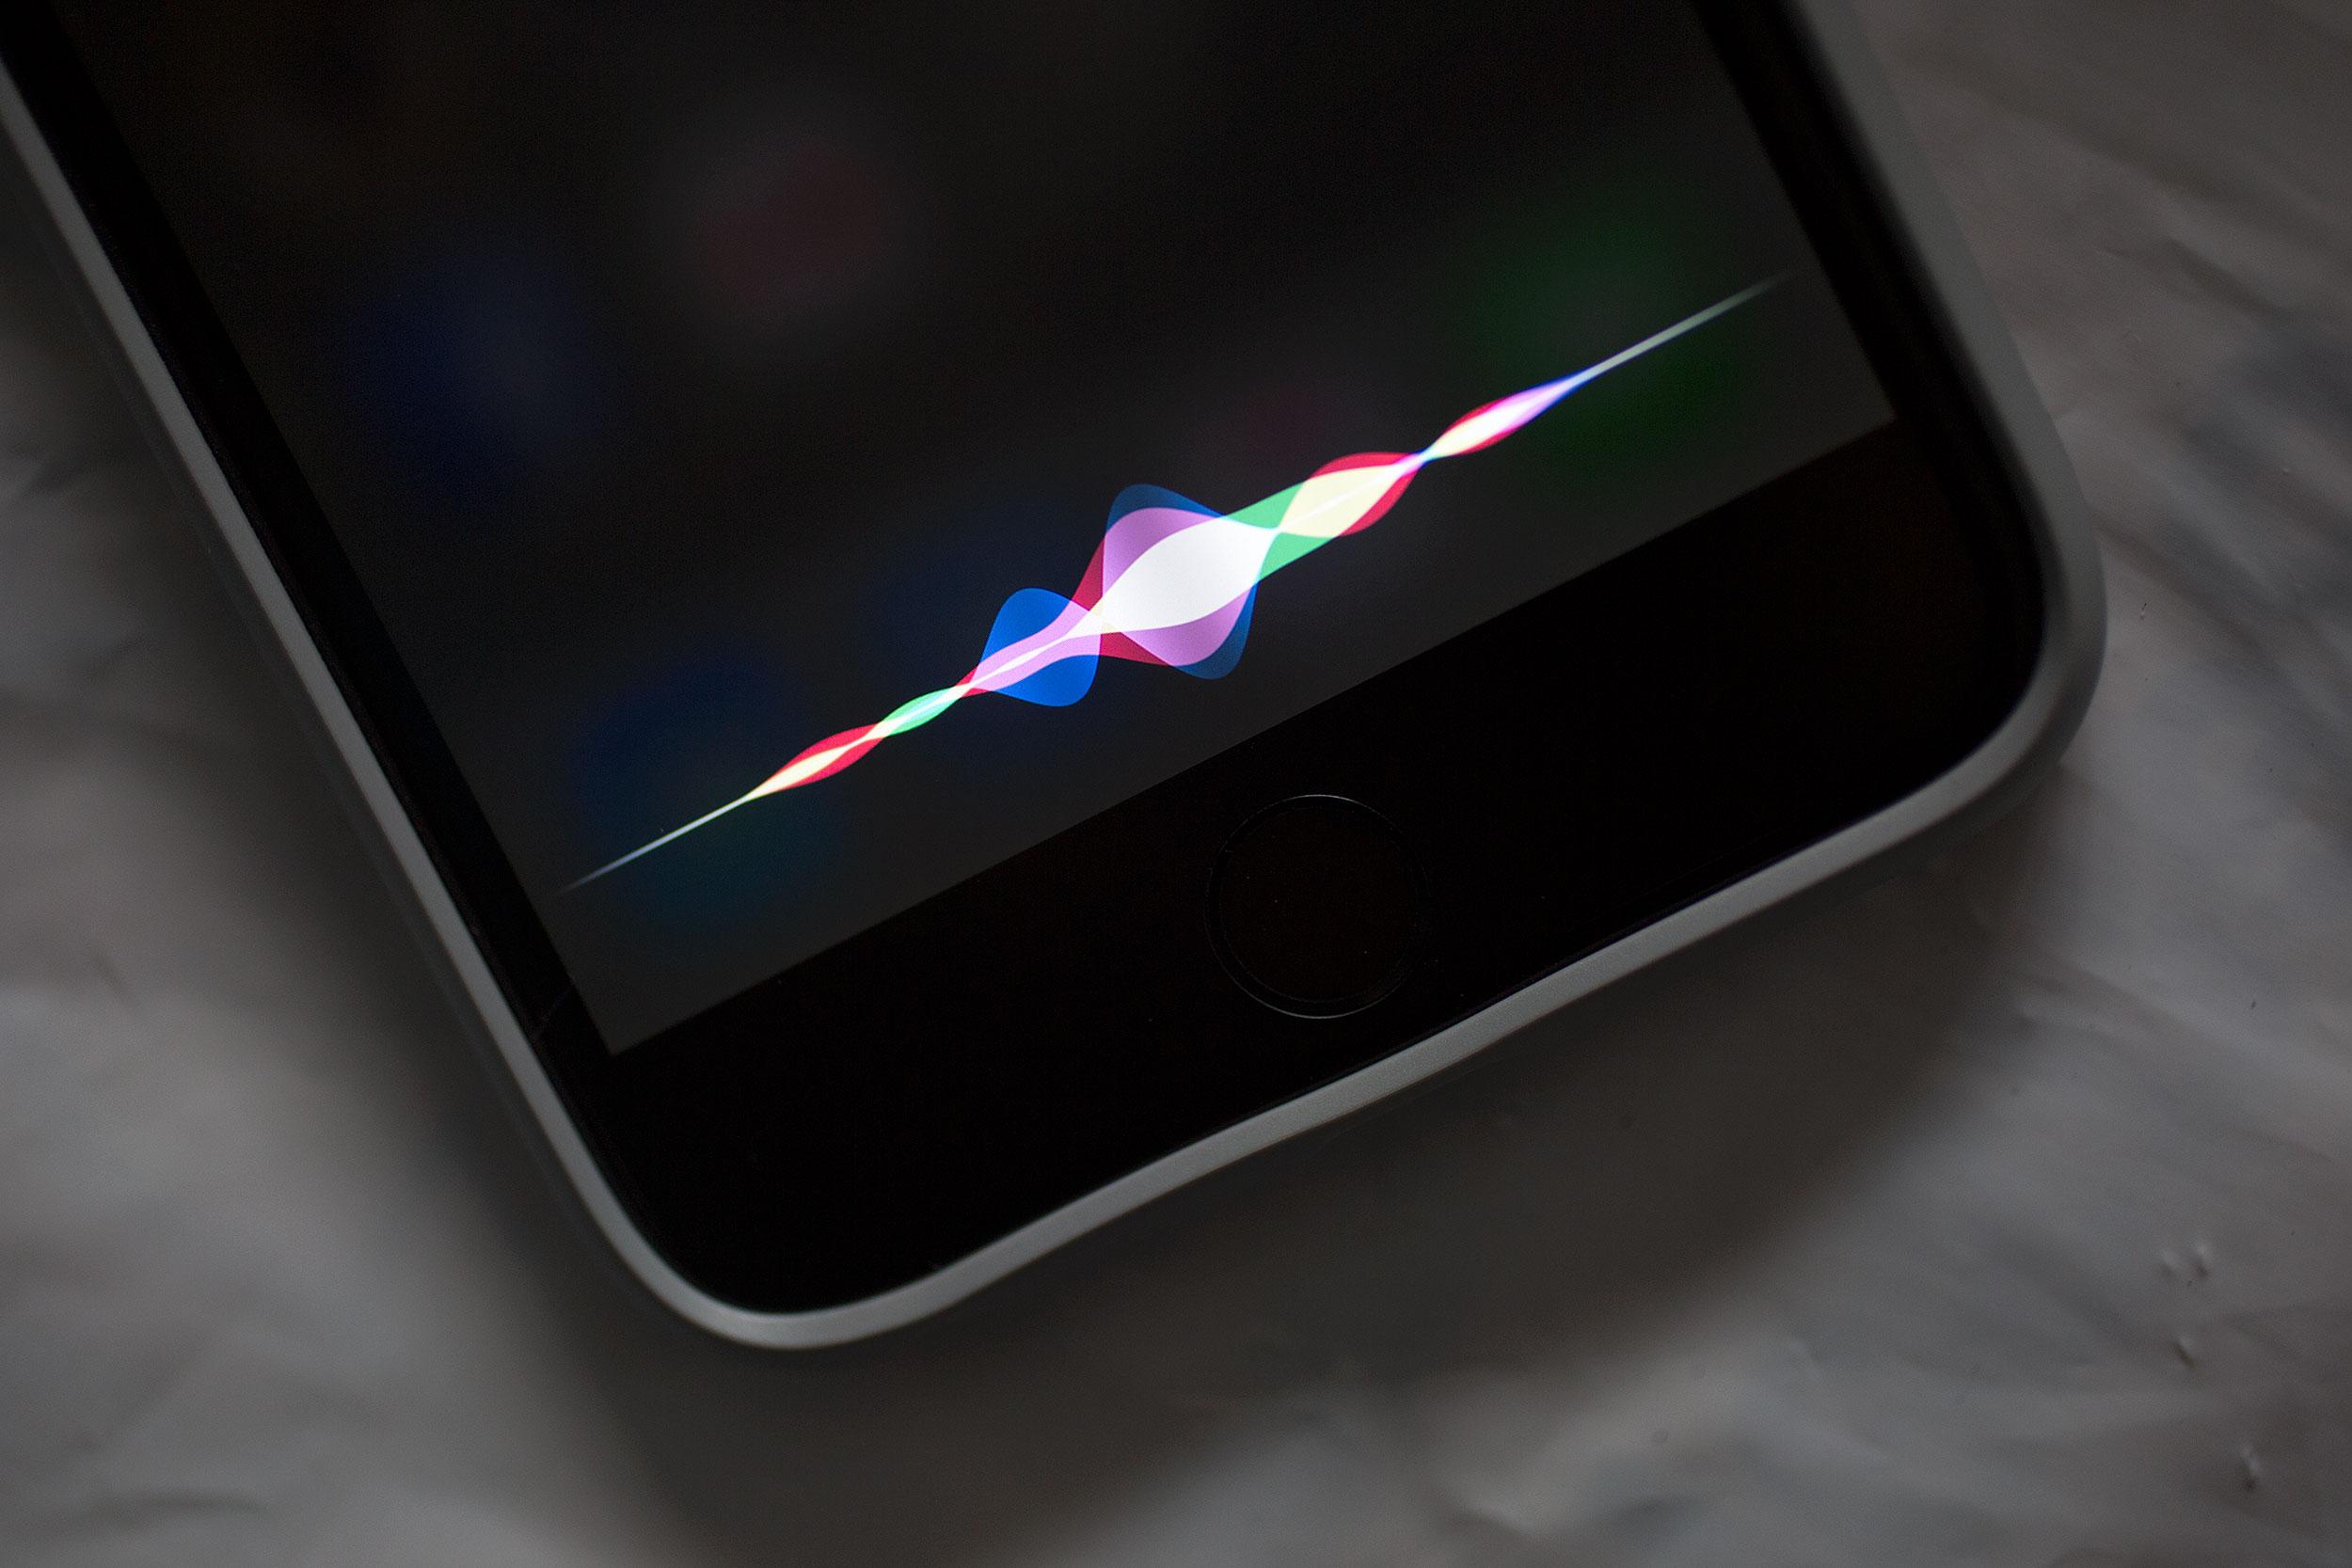 siri приветsiri на android, siri привет, siri дура, siri siri, siri приколы, siri что это, siri ты глупая, siri iphone 4, siri как тебя зовут, siri поговори со мной, siri iphone, siri тупая, siri как меня зовут, siri ok google, siri online, siri спой песню, siri это ты, siri google, siri скачать на компьютер, siri для windows